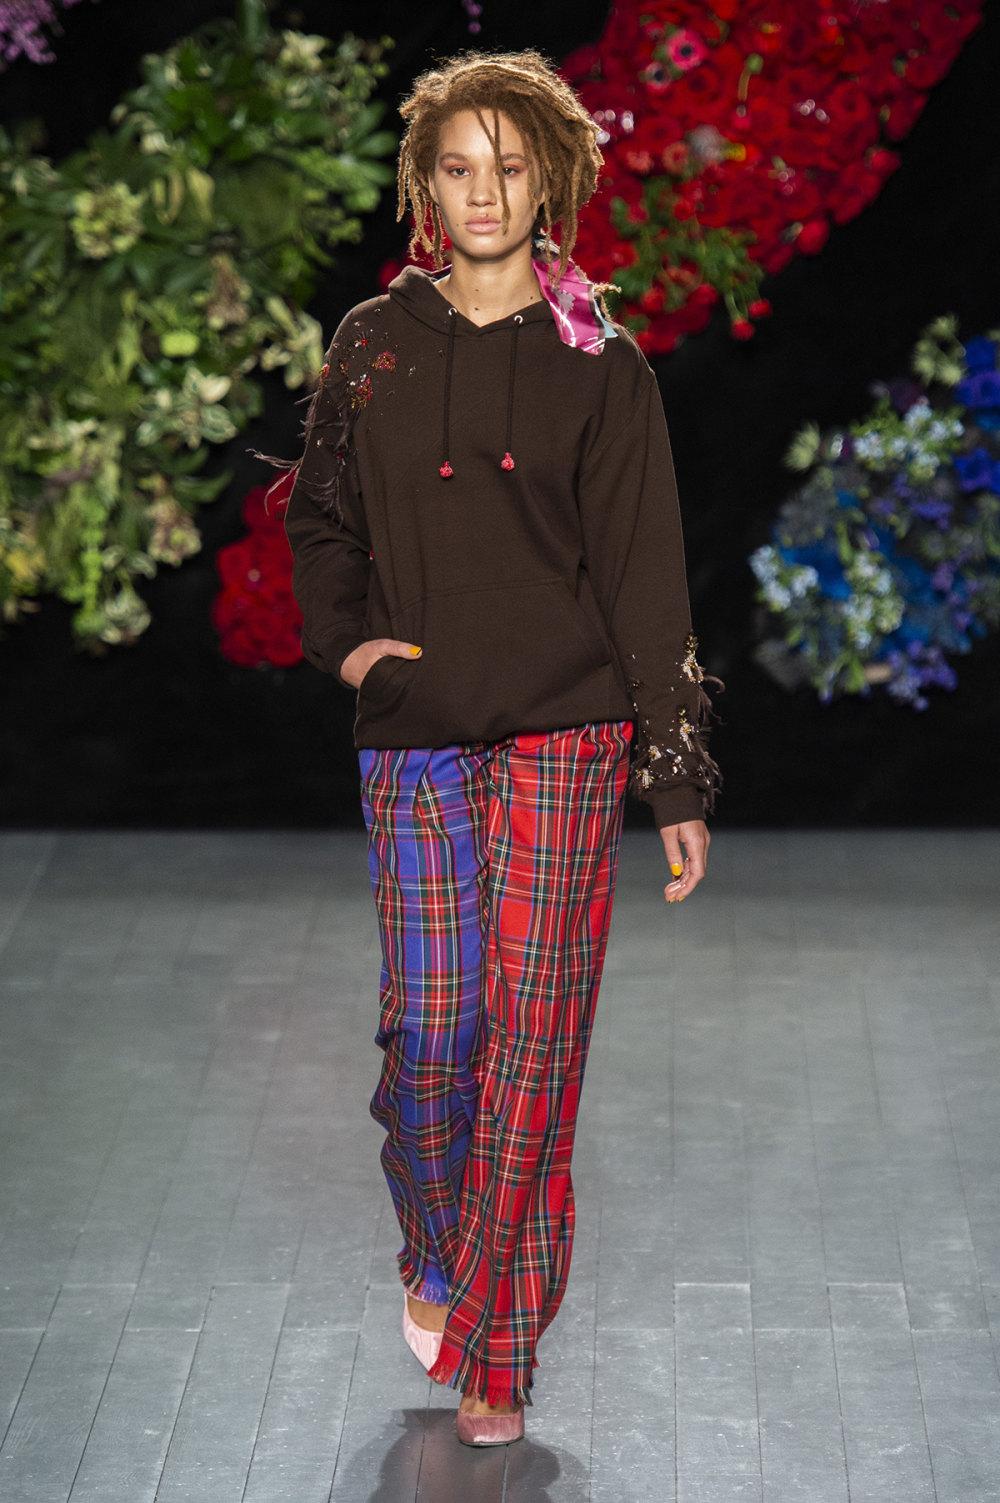 Roberta Einer时装系列格子呢西装外套收紧腰部霓虹色腰带连帽衫-20.jpg